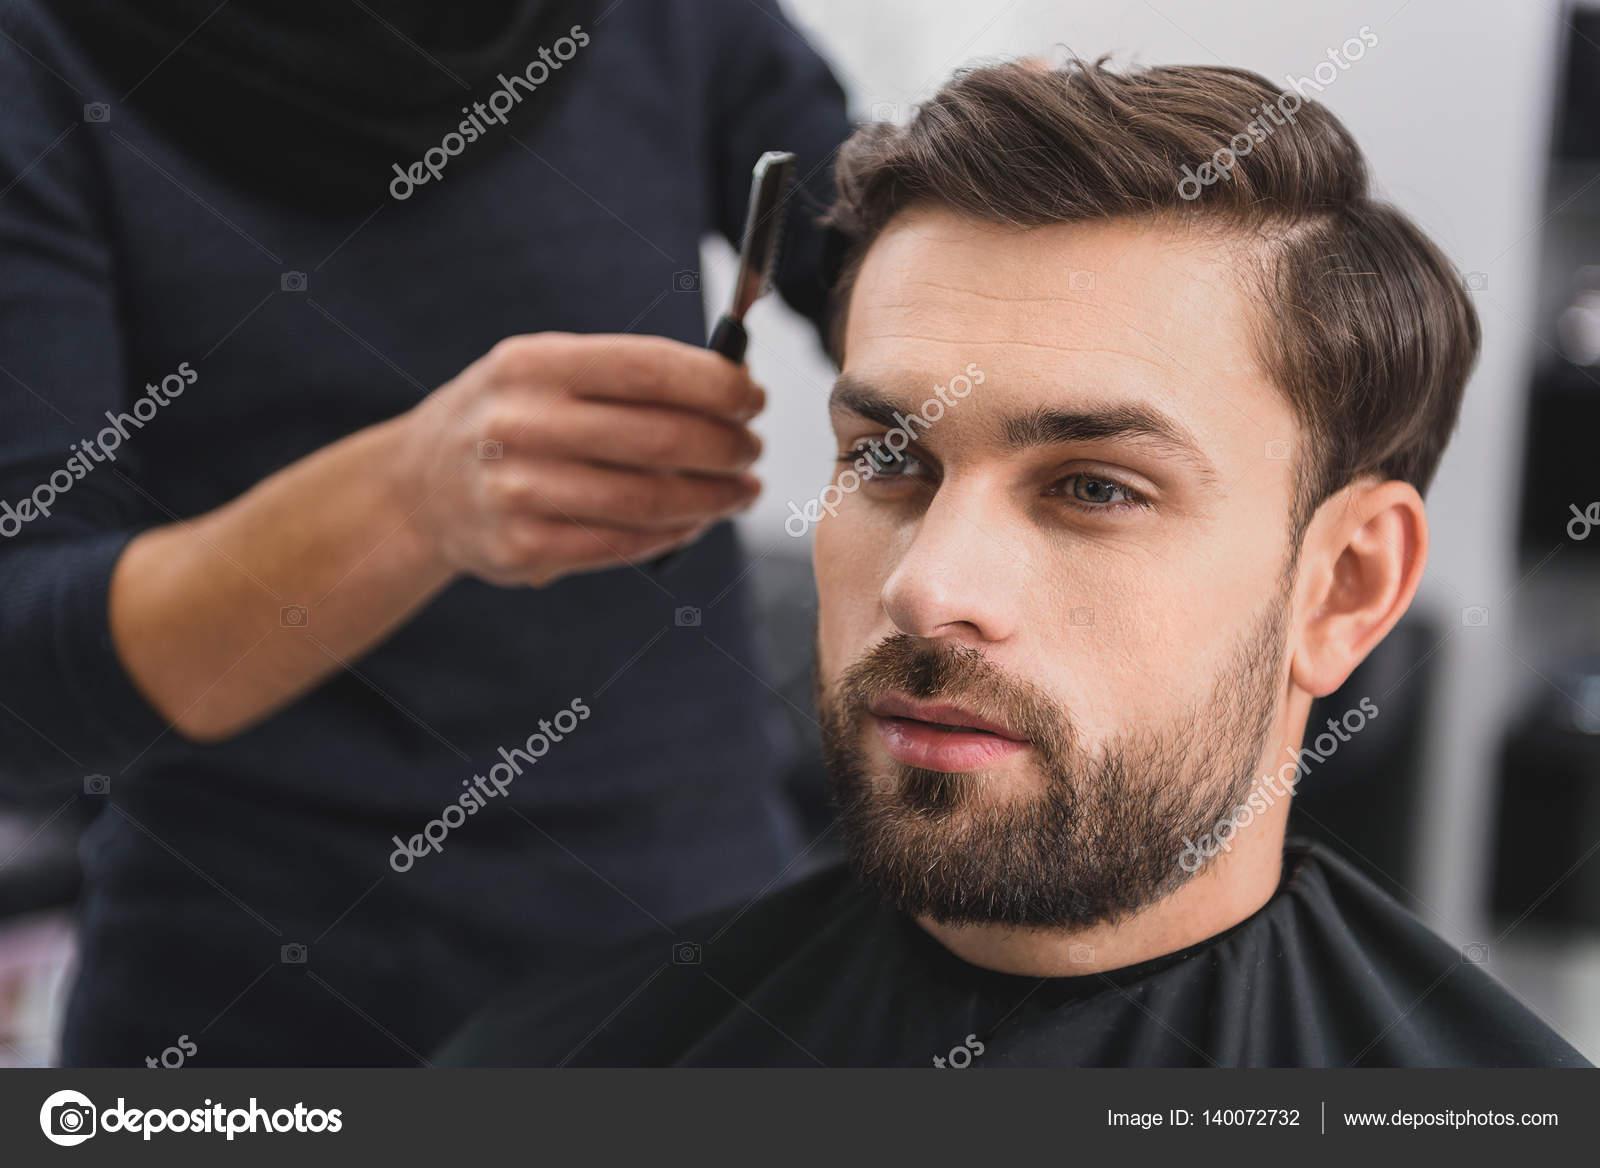 Hairstyle men indian